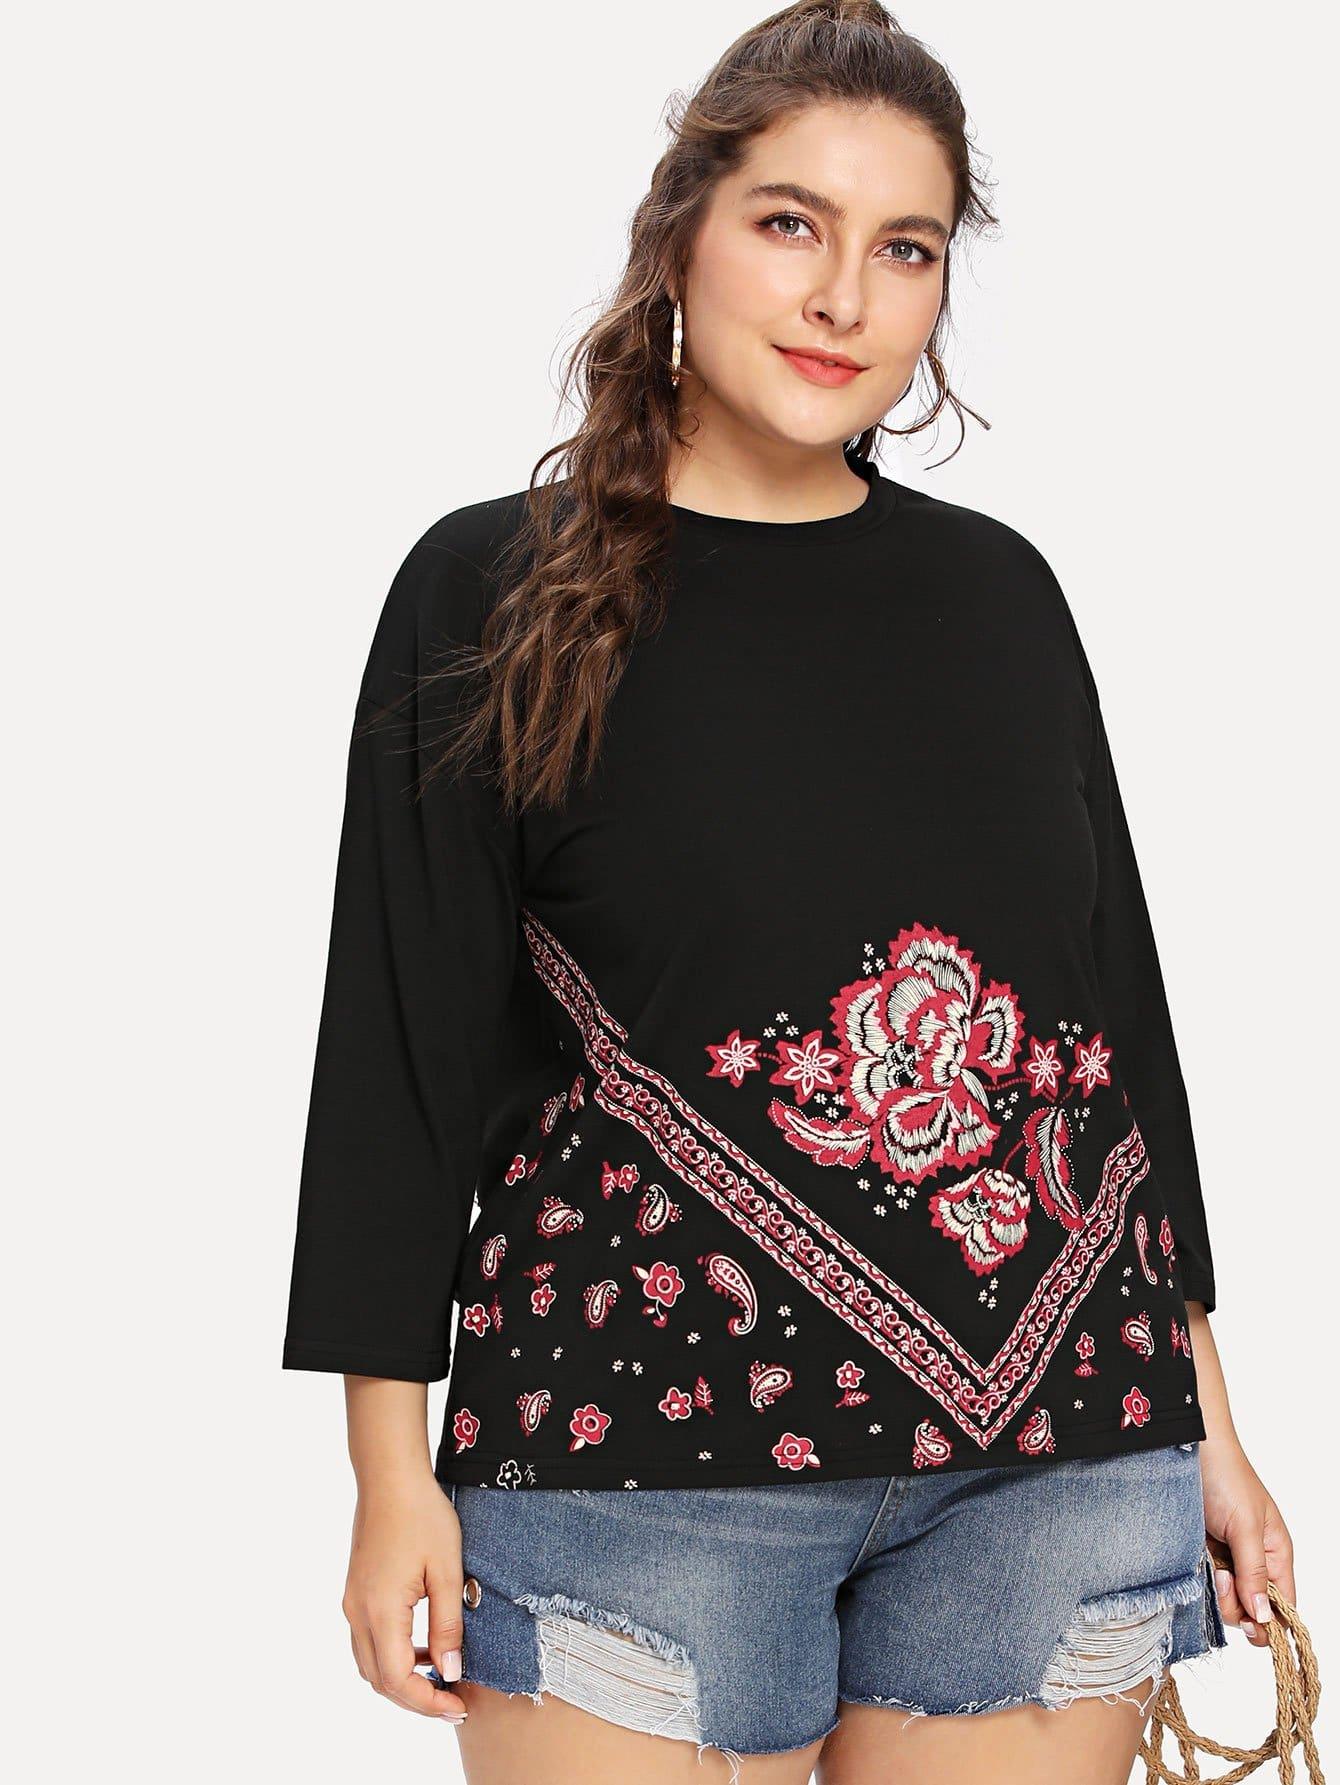 Flower Print T-shirt redfox футболка flower t 42 4300 желтый